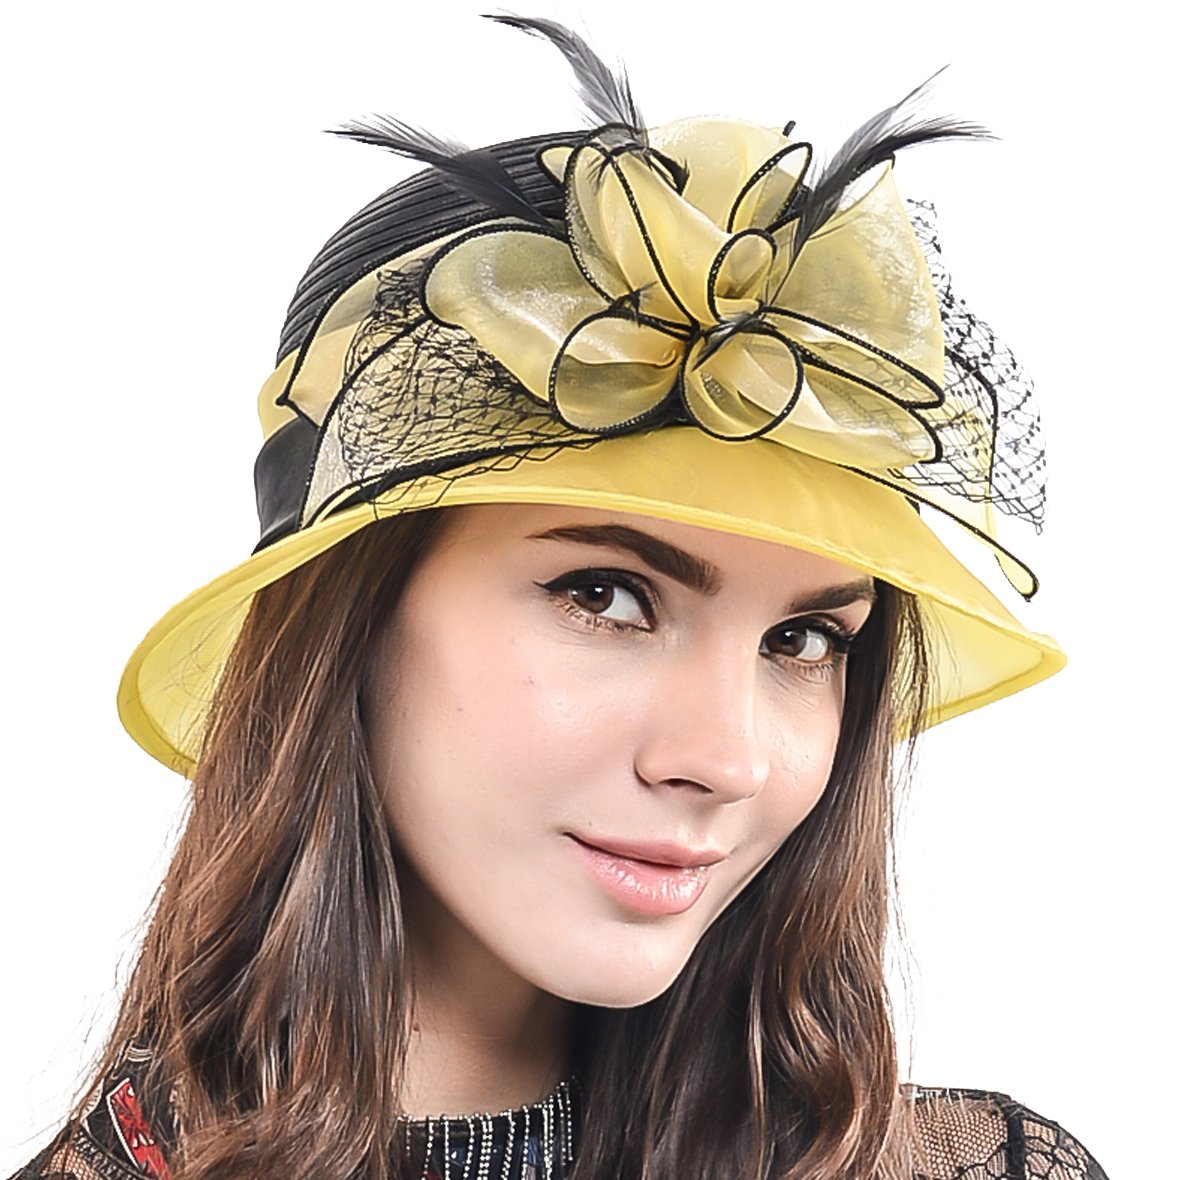 HISSHE Sweet Cute Cloche Oaks Church Dress Bowler Derby Wedding Hat Party S606-A, Yellow, Medium by HISSHE (Image #3)